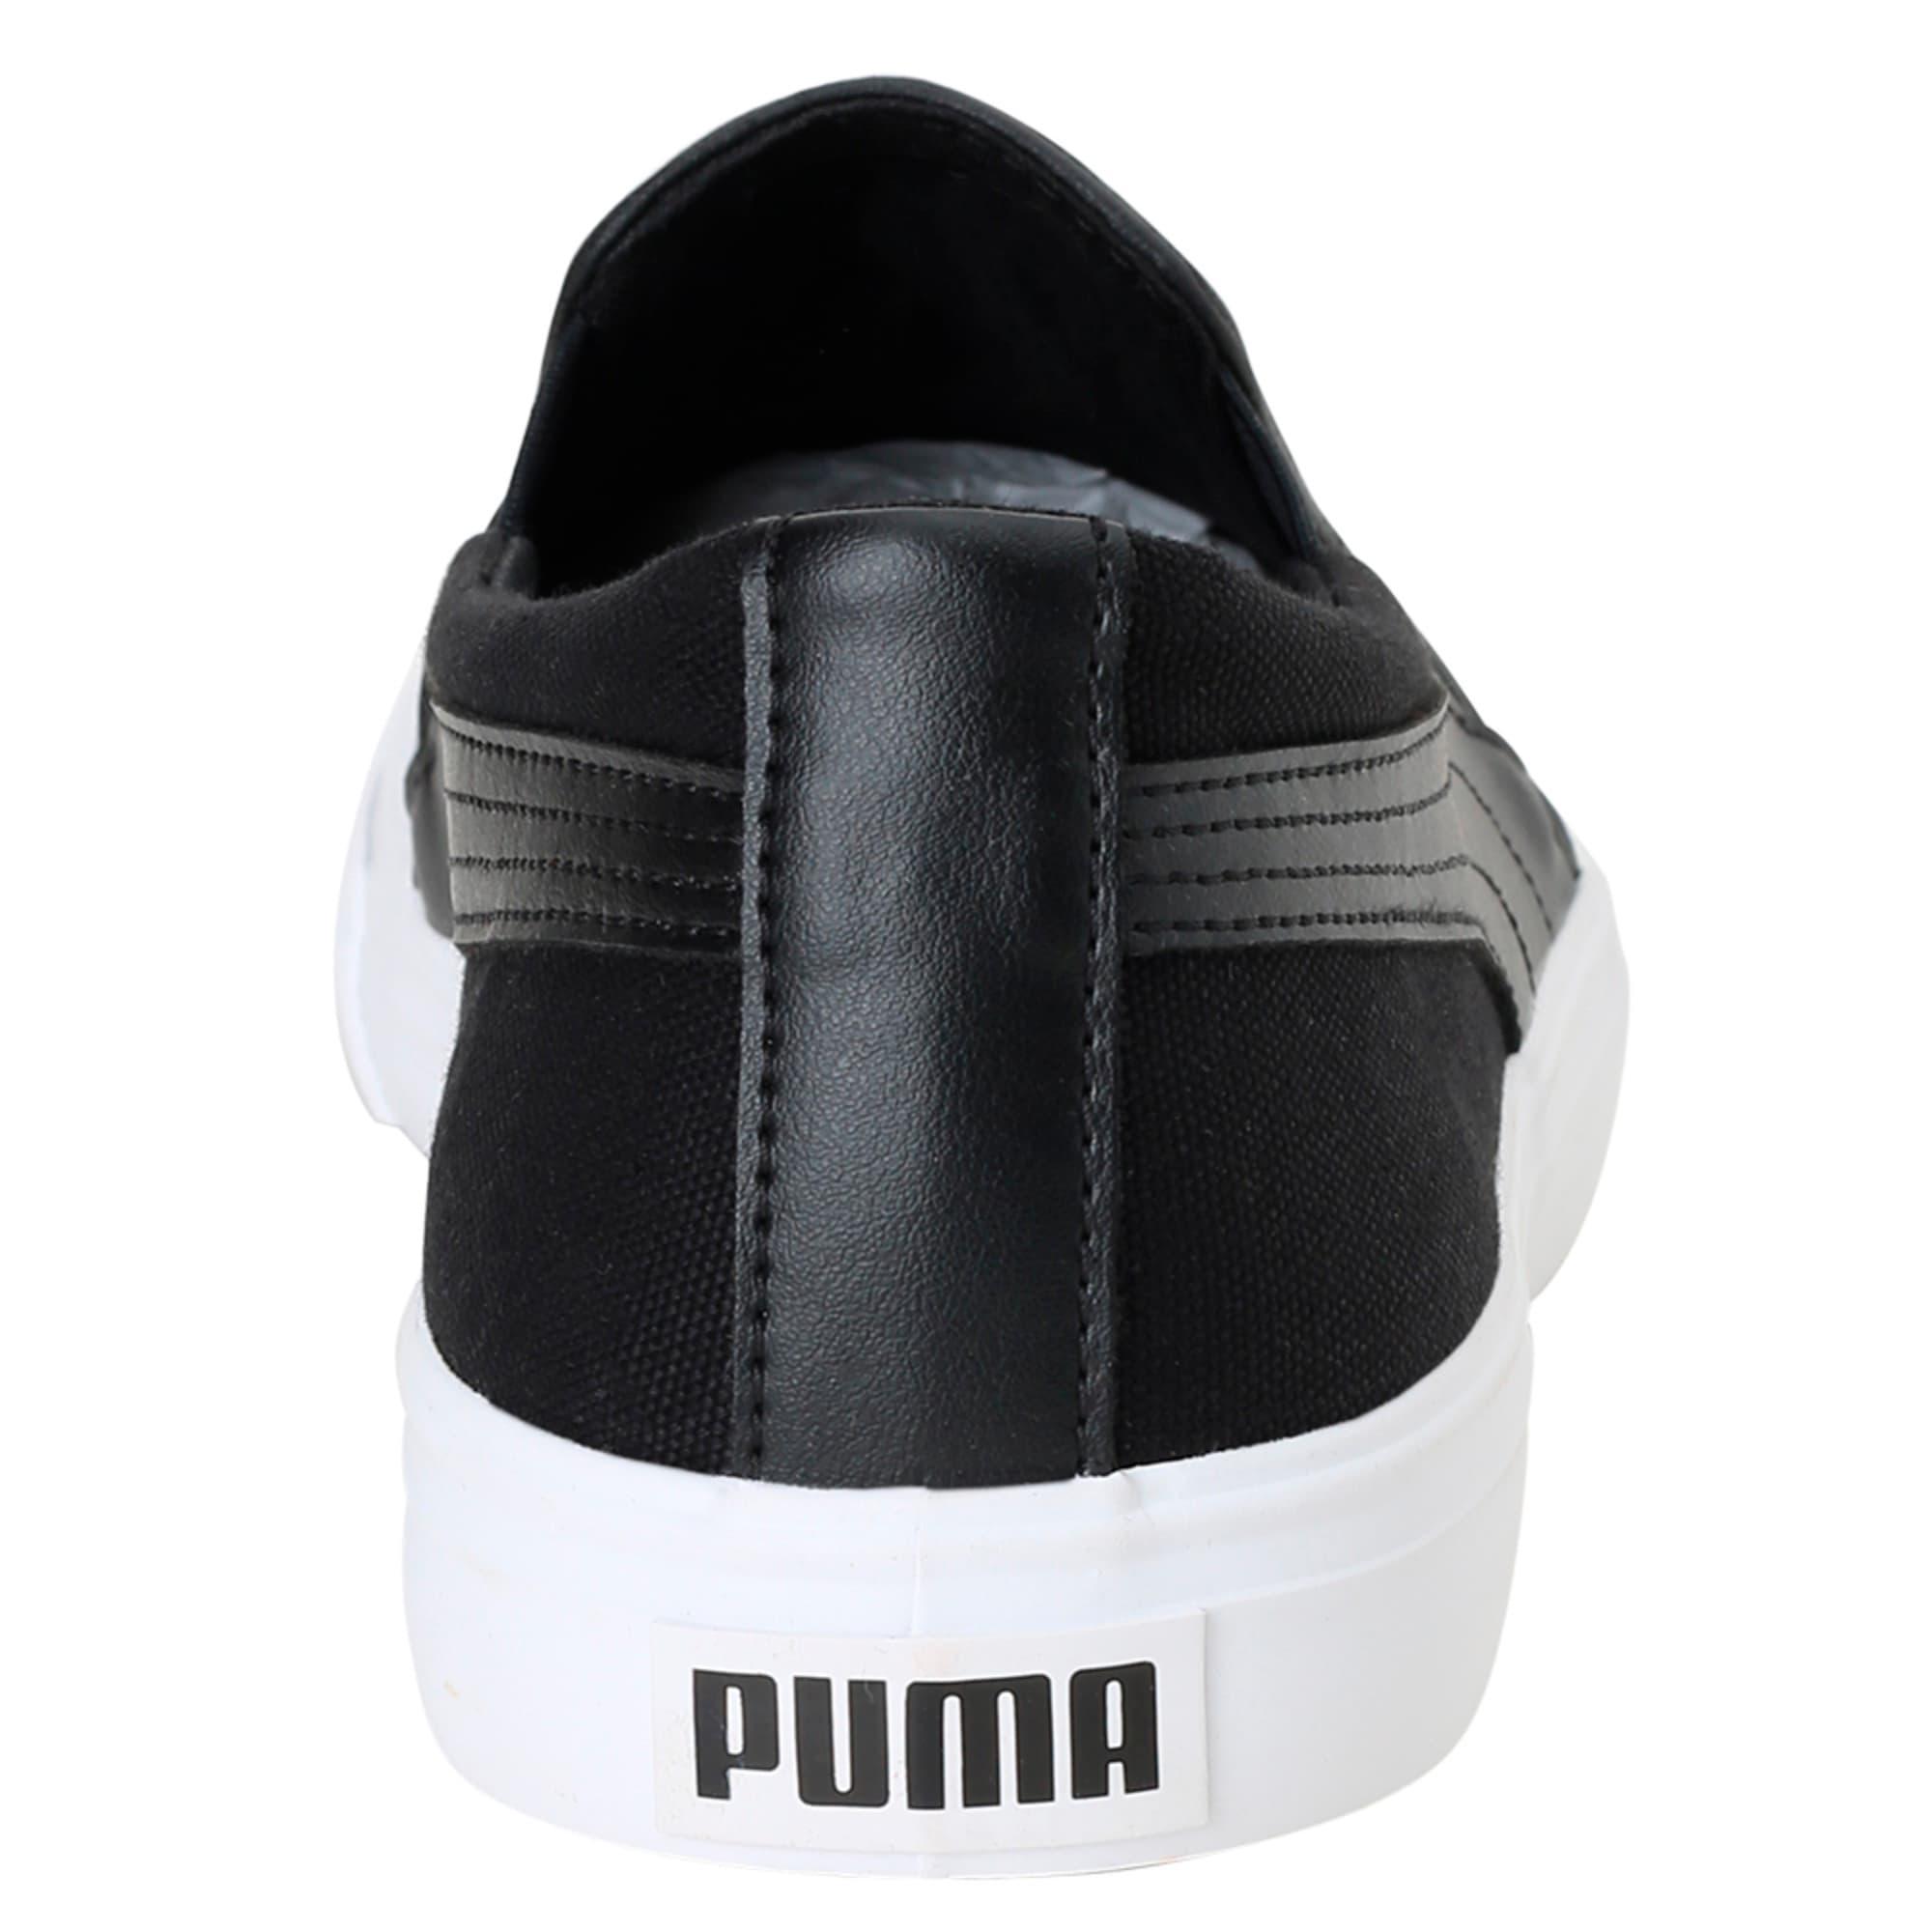 Thumbnail 4 of Puma One8 Slip-on, Black-White-Pomegranate, medium-IND